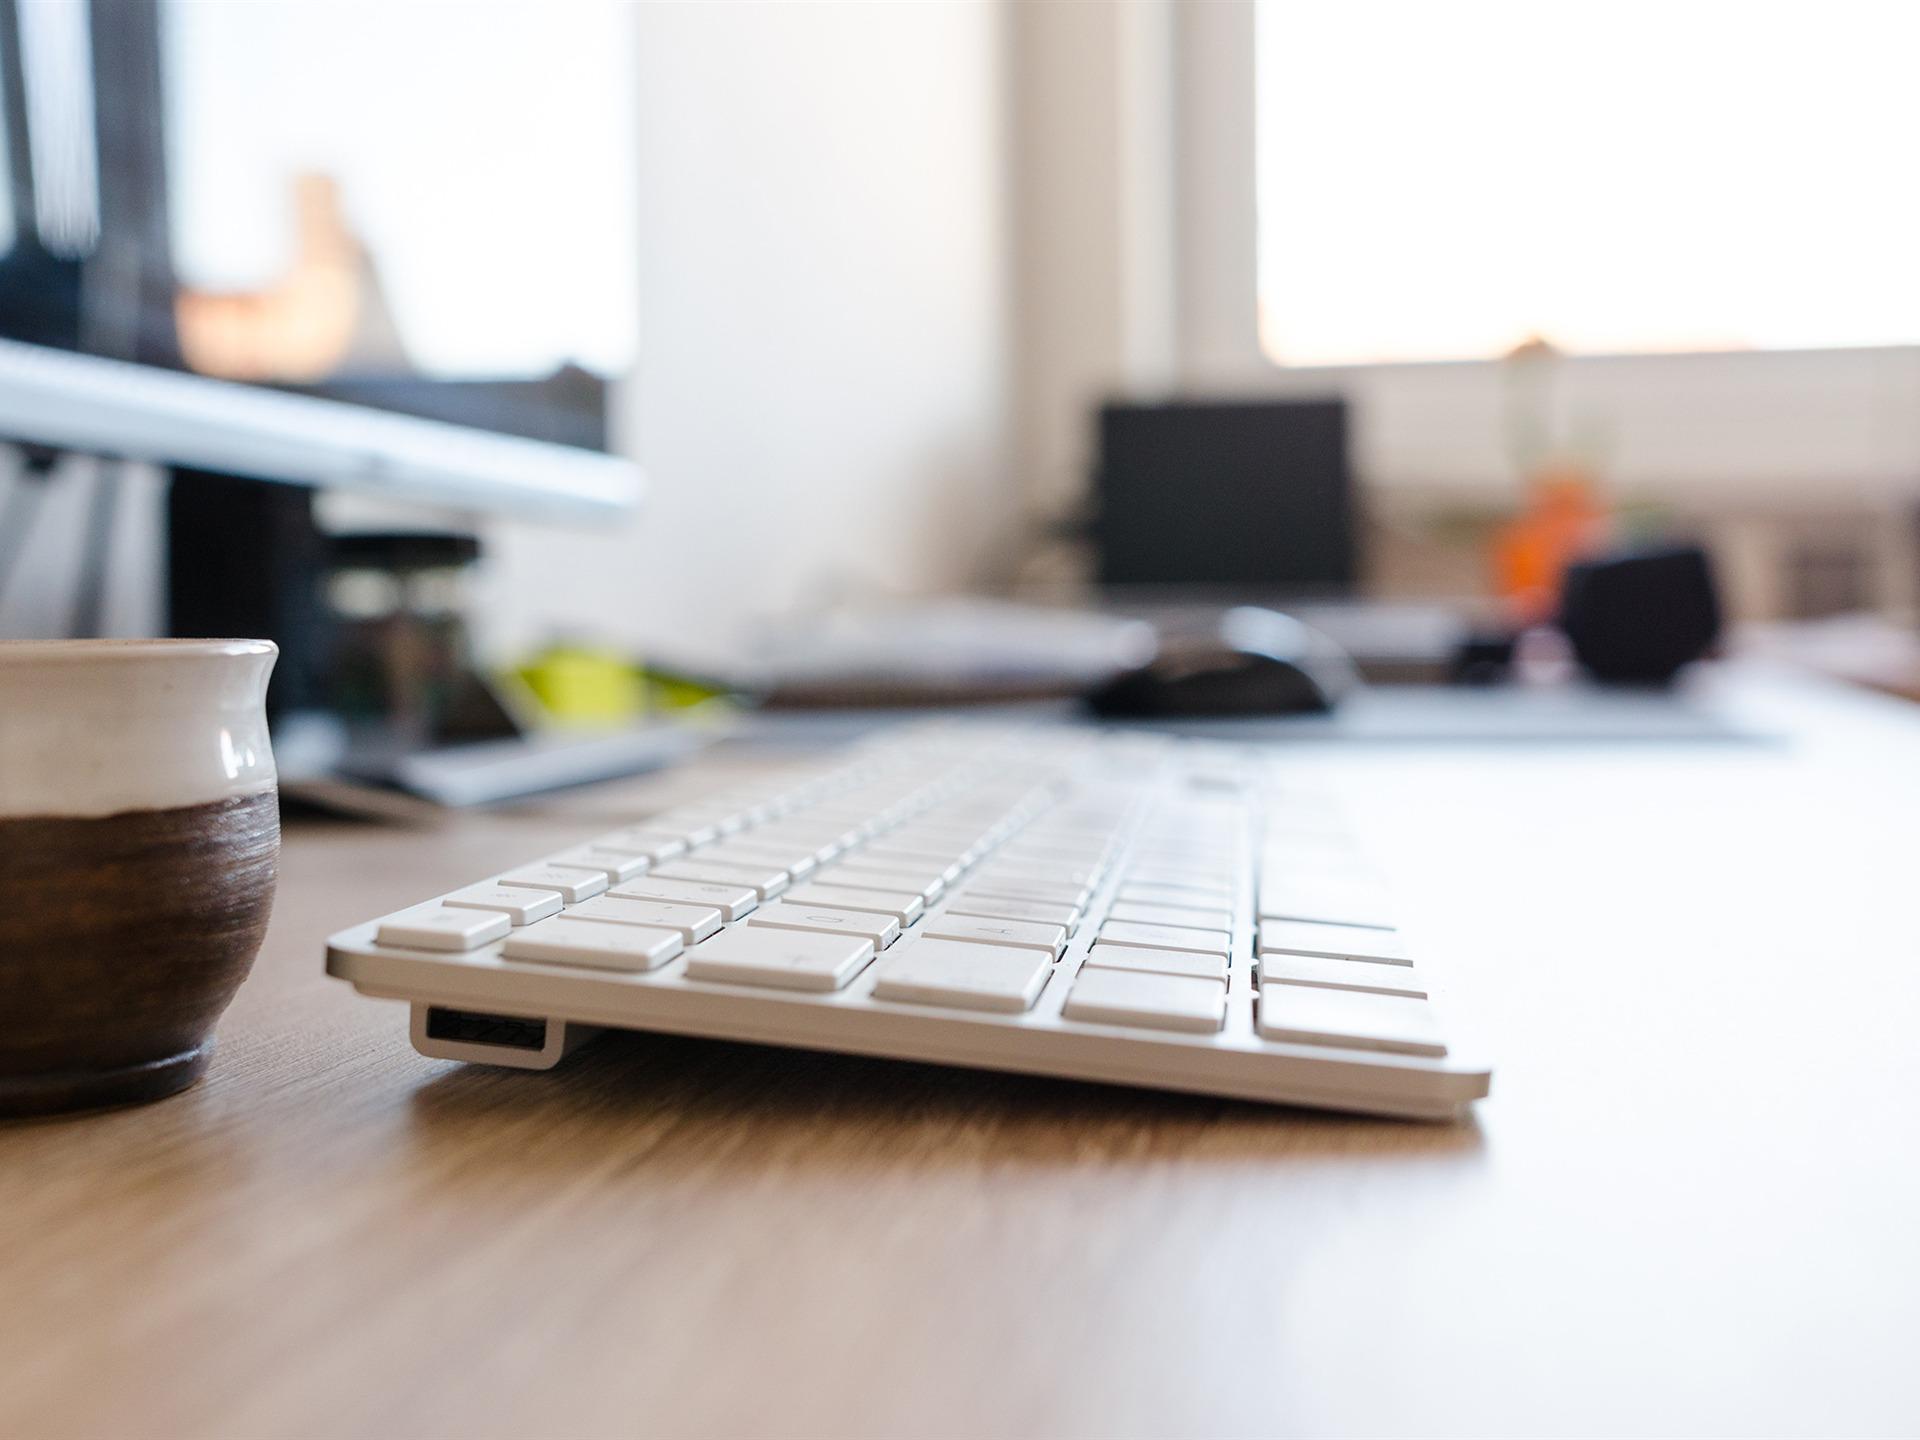 Office Desk Keyboard Art Cup Photo Hd Wallpaper Preview